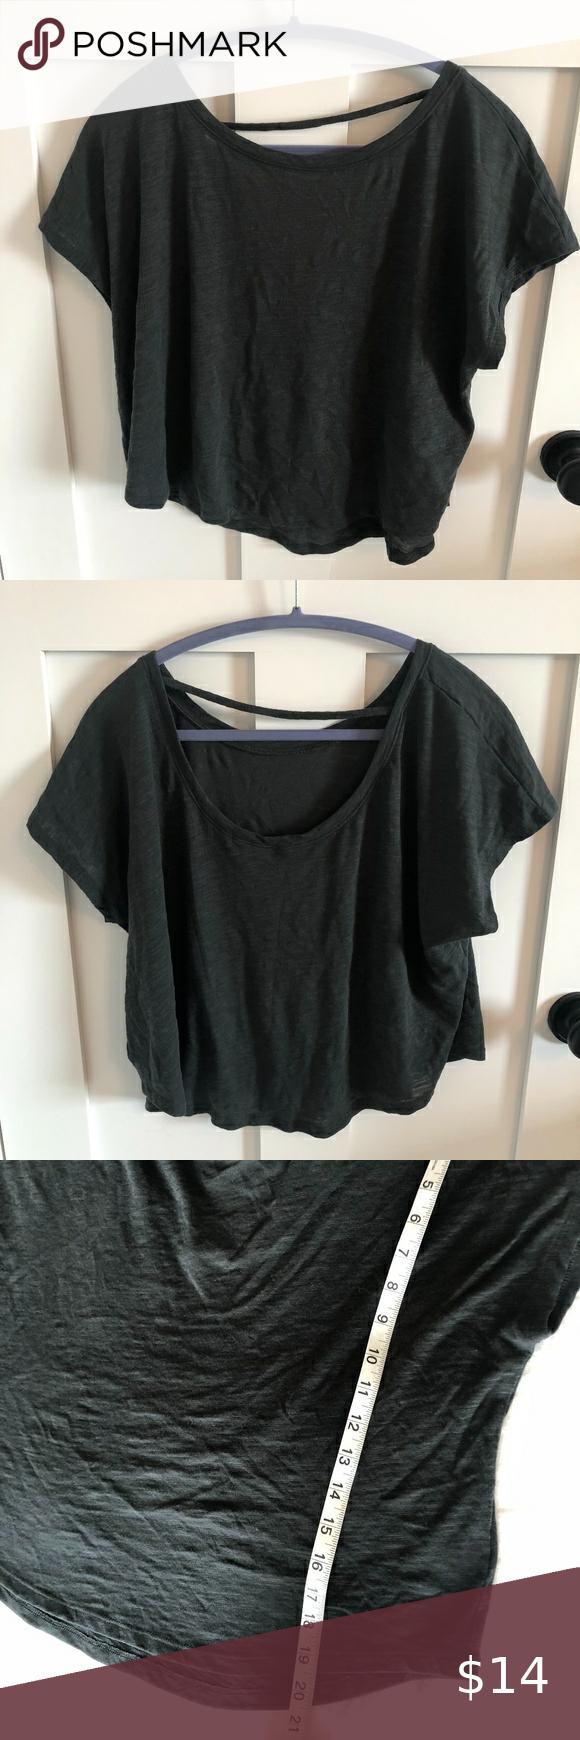 Athleta Cropped Open Back T Shirt Clothes Design Athleta Black Shirt